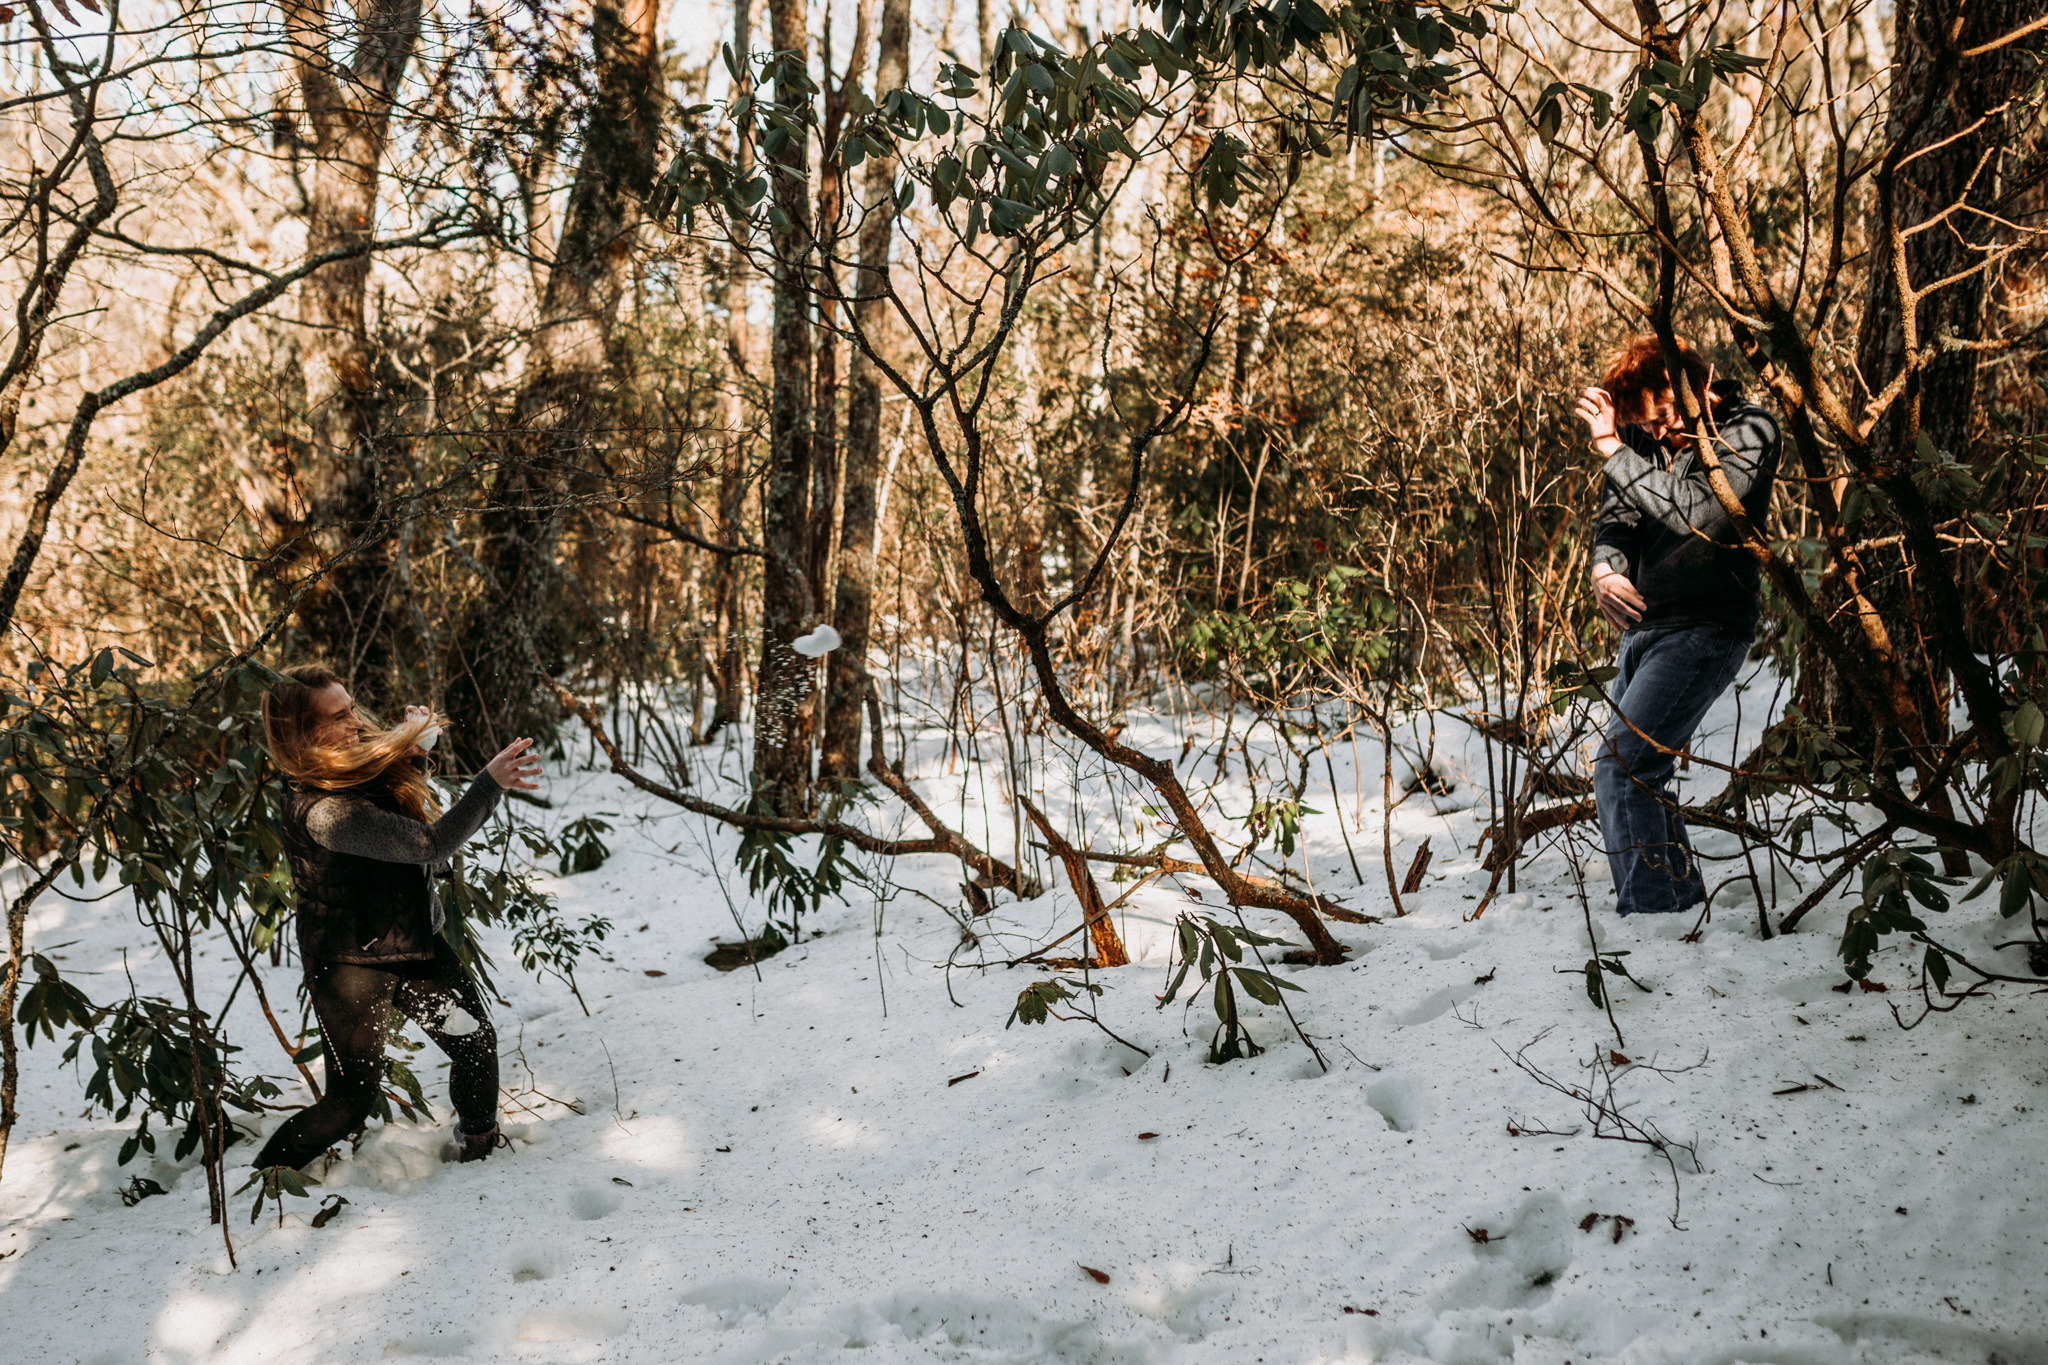 MonicaLeavellPhoto-AshleyMitch-NorthCarolina-Adventure-Engagement-Photographer-11.jpg